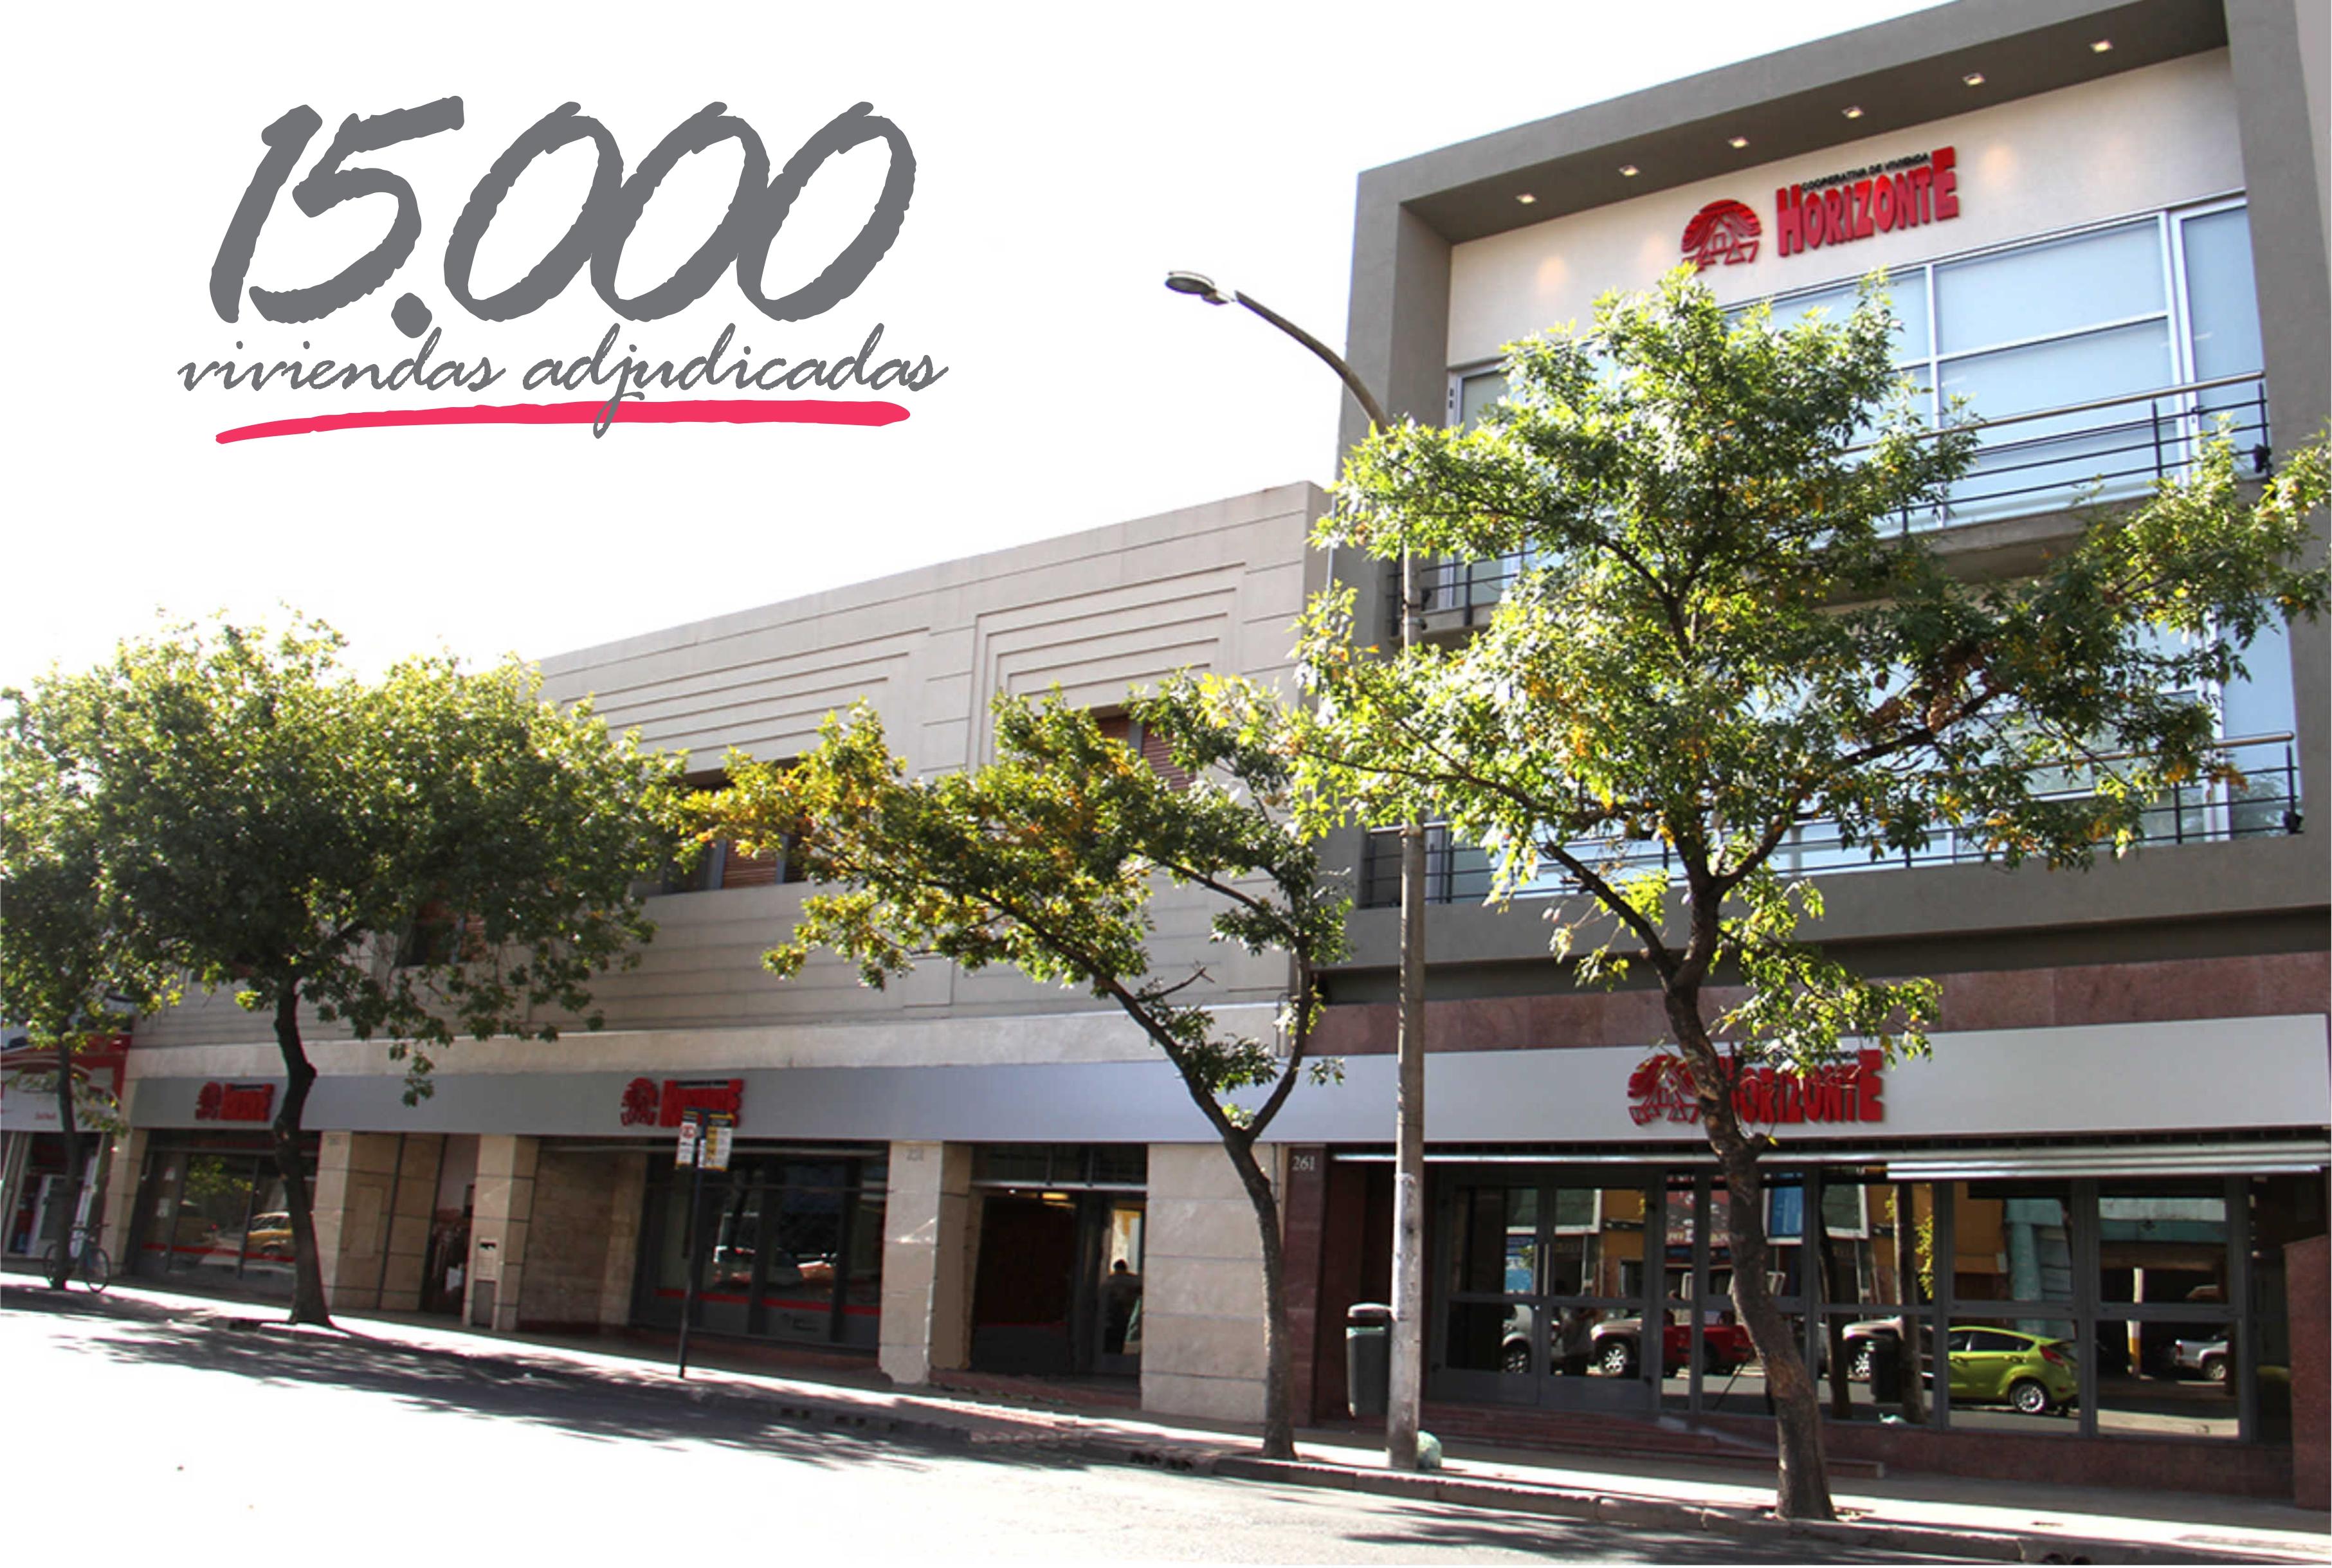 img-fachada15000